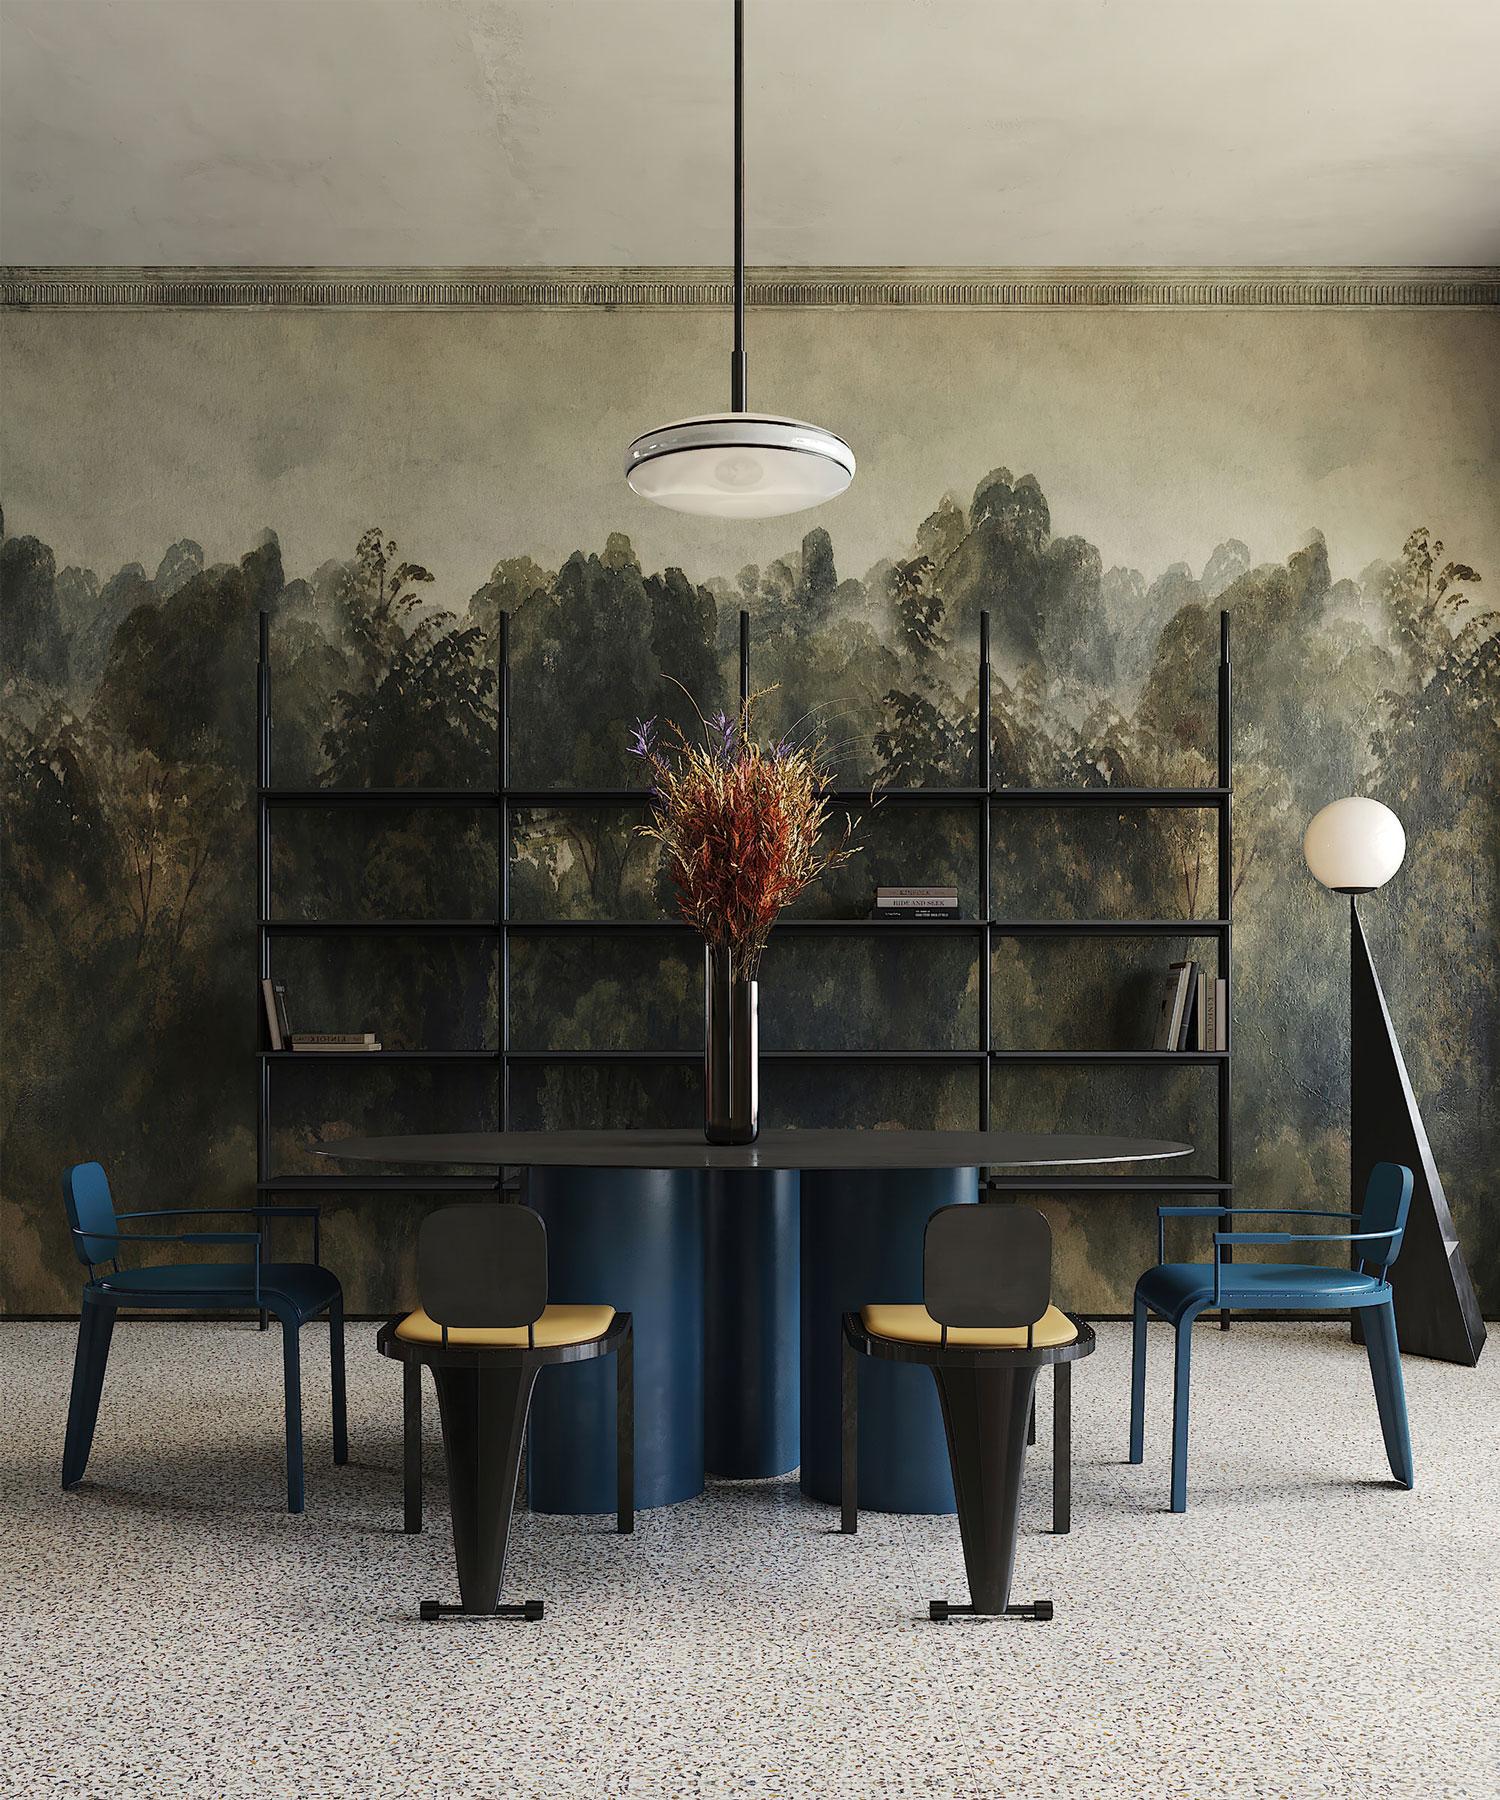 Puntofilipino Memphis Milano Apartament Interiors Photo Polina Parcevskya Yellowtrace 02